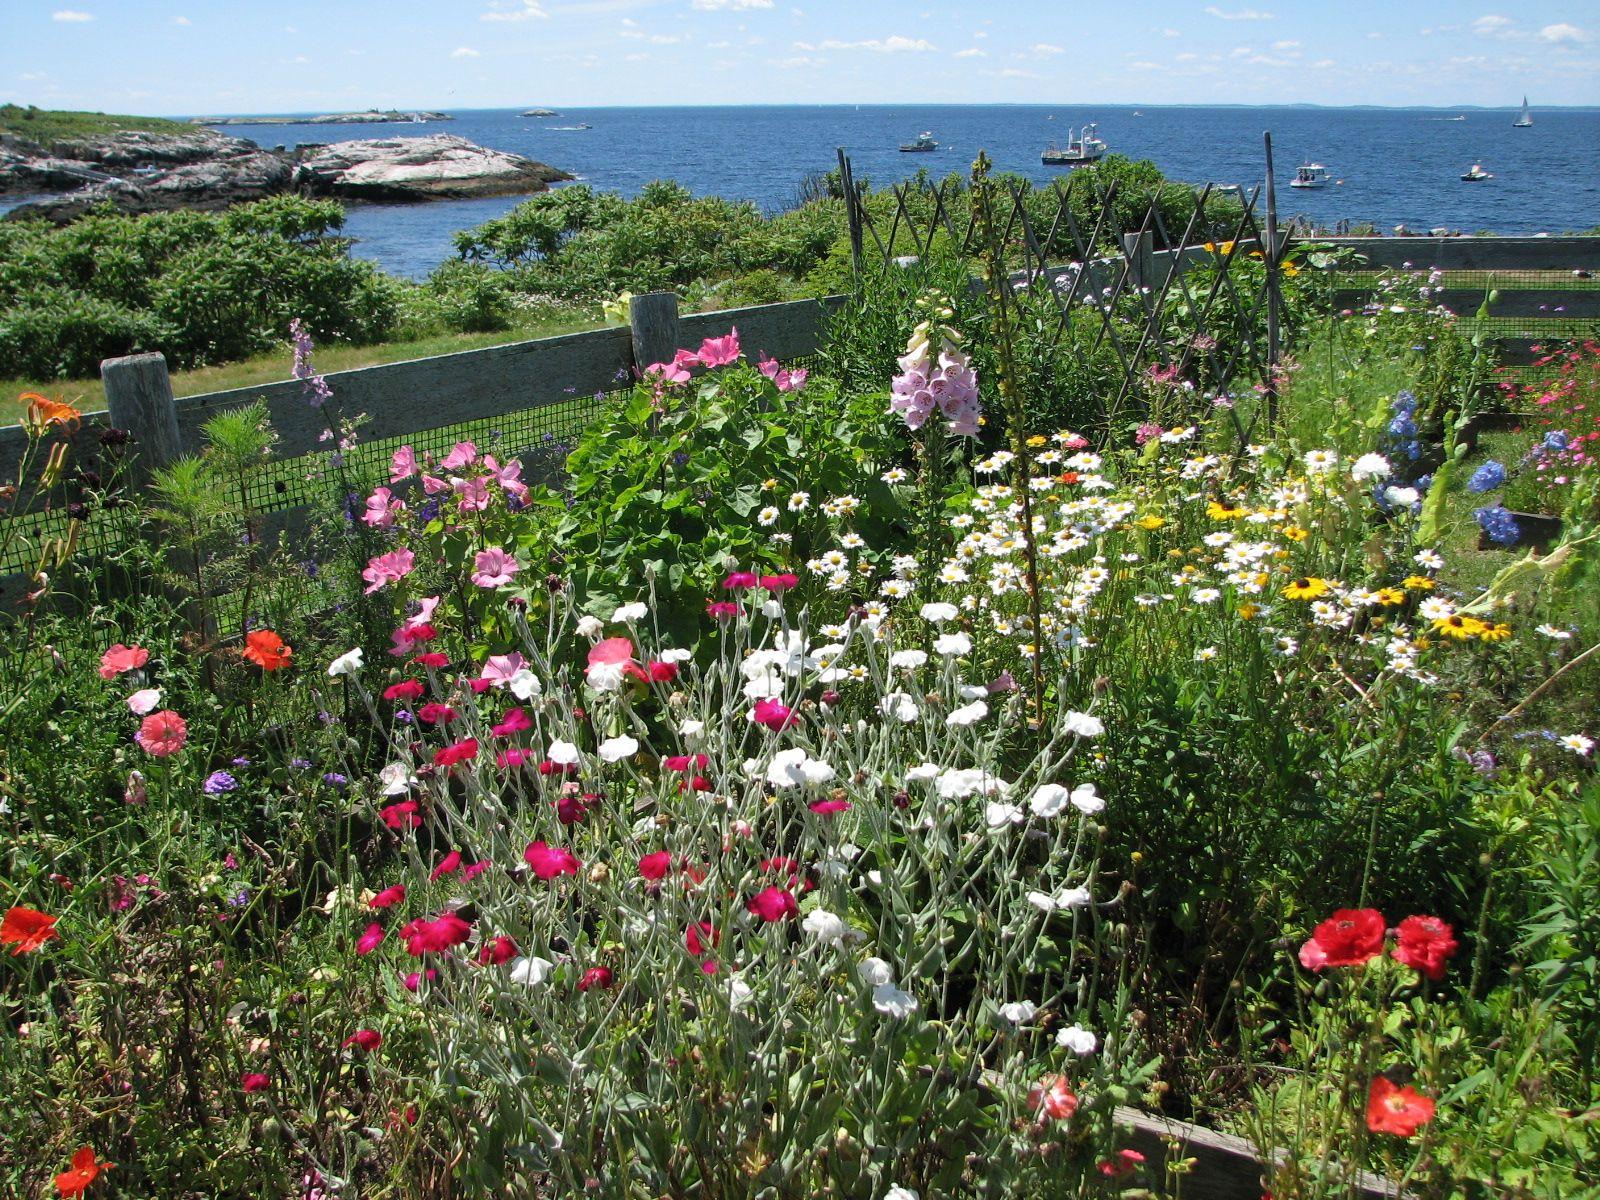 isles of shoals Celia Thaxter's garden next last Dream